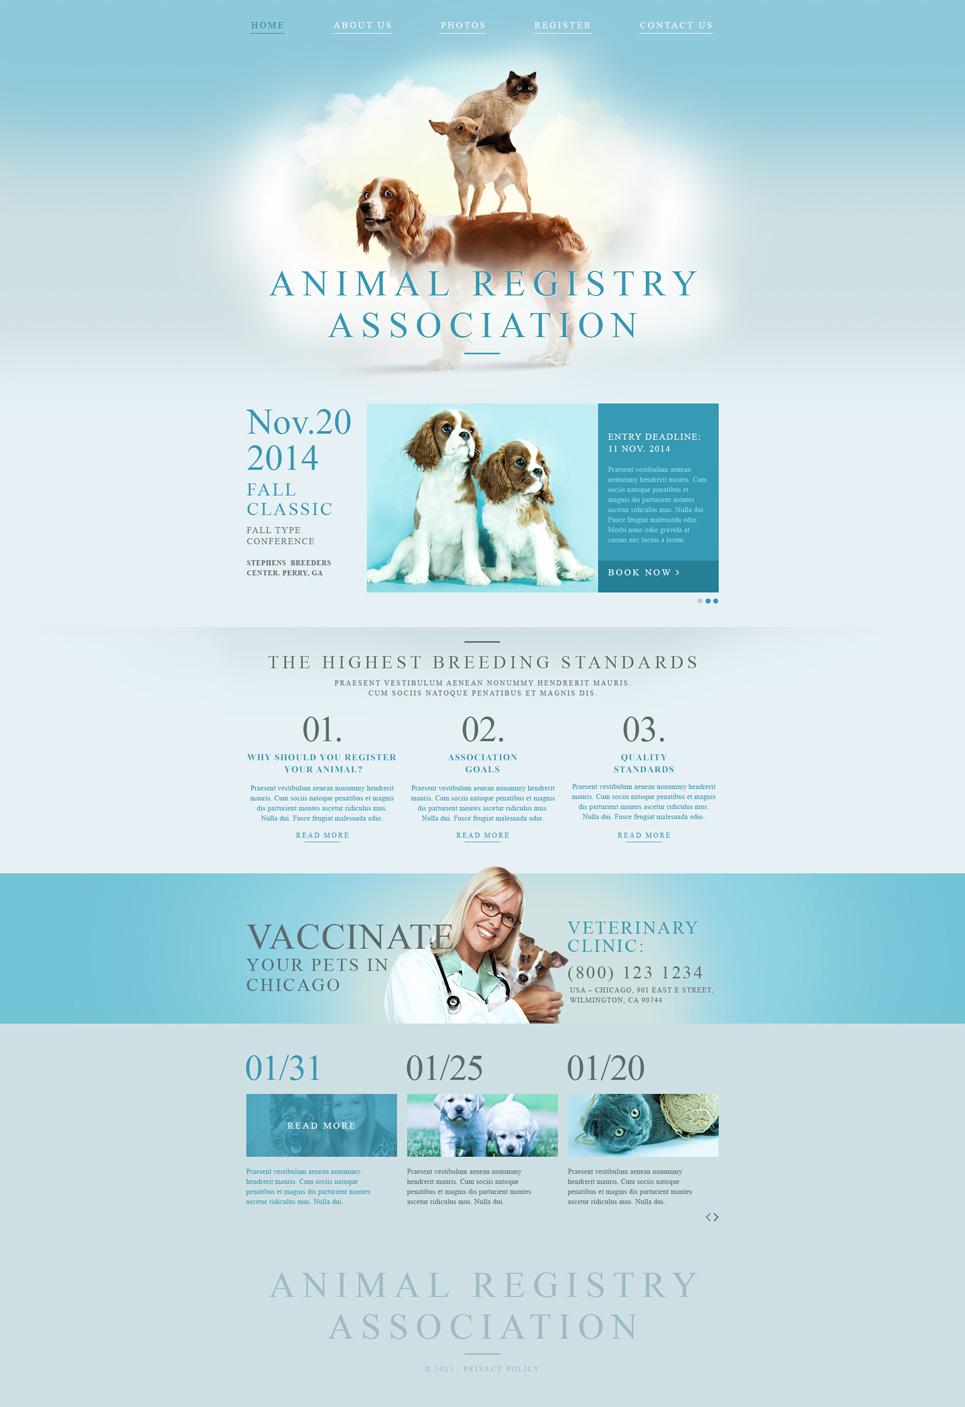 Animal Registry Association template illustration image